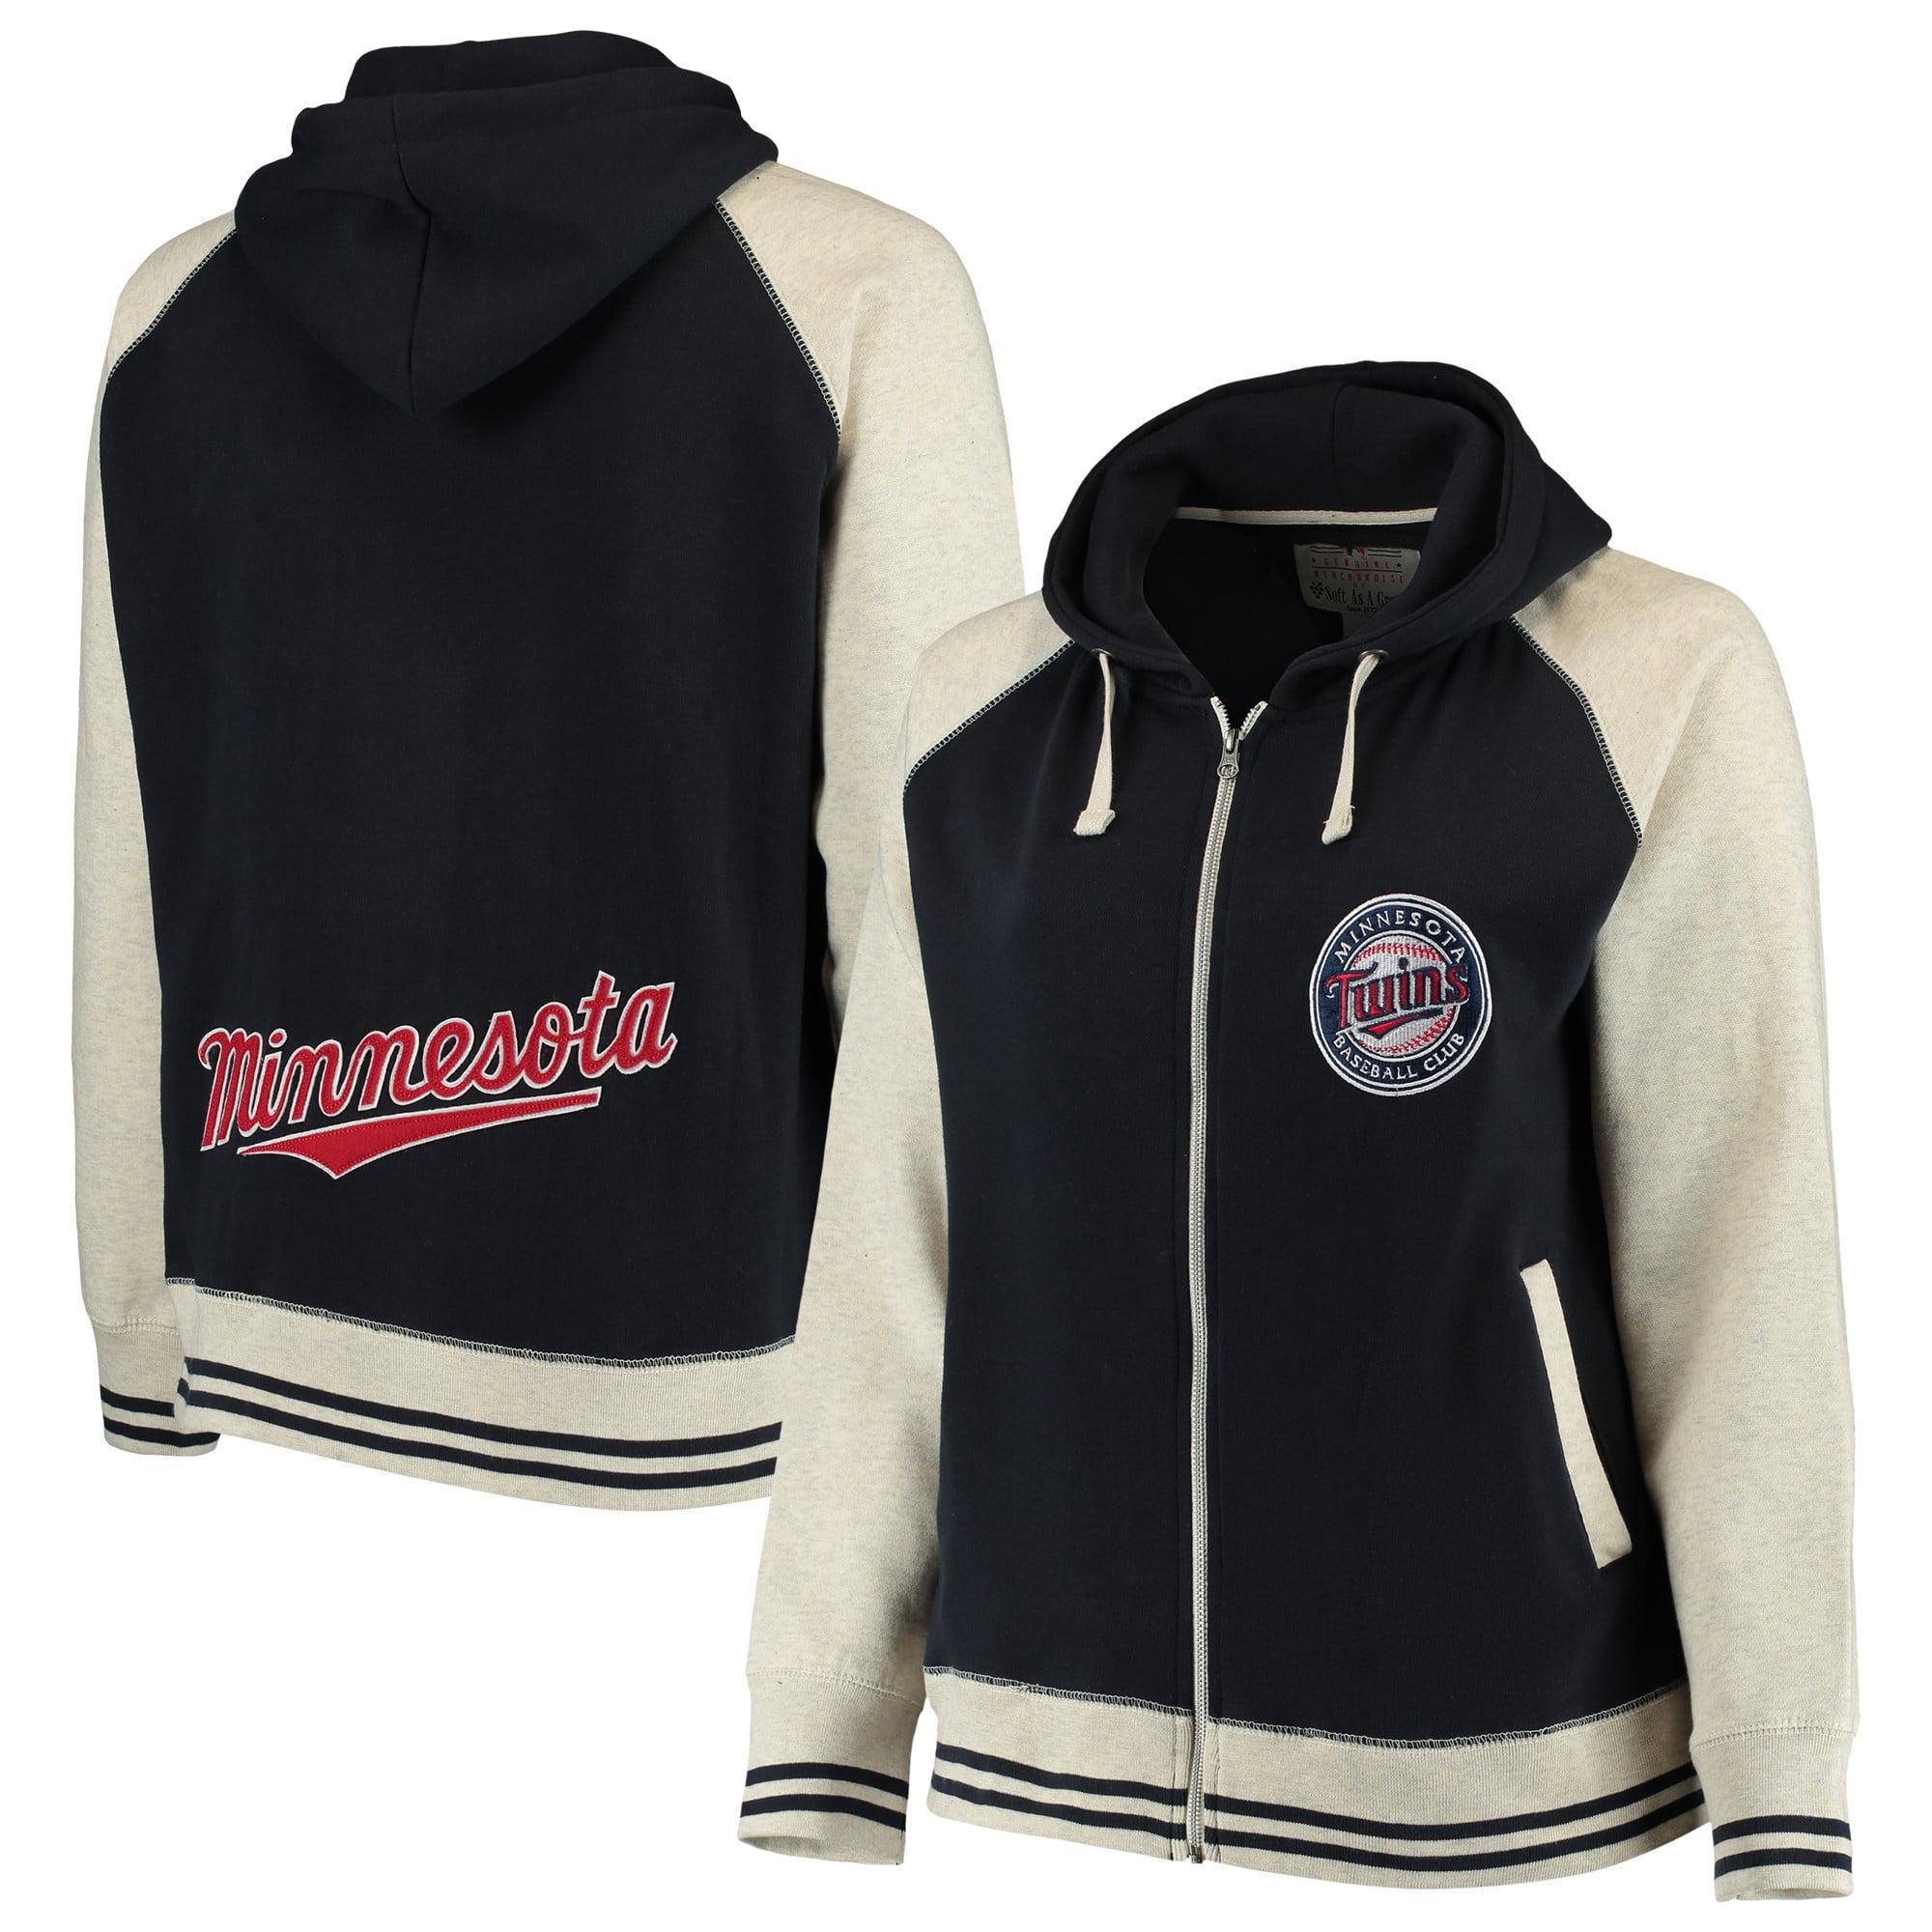 Minnesota Twins Soft as a Grape Women's Plus Size Varsity Raglan Full-Zip Hoodie - Navy/Cream